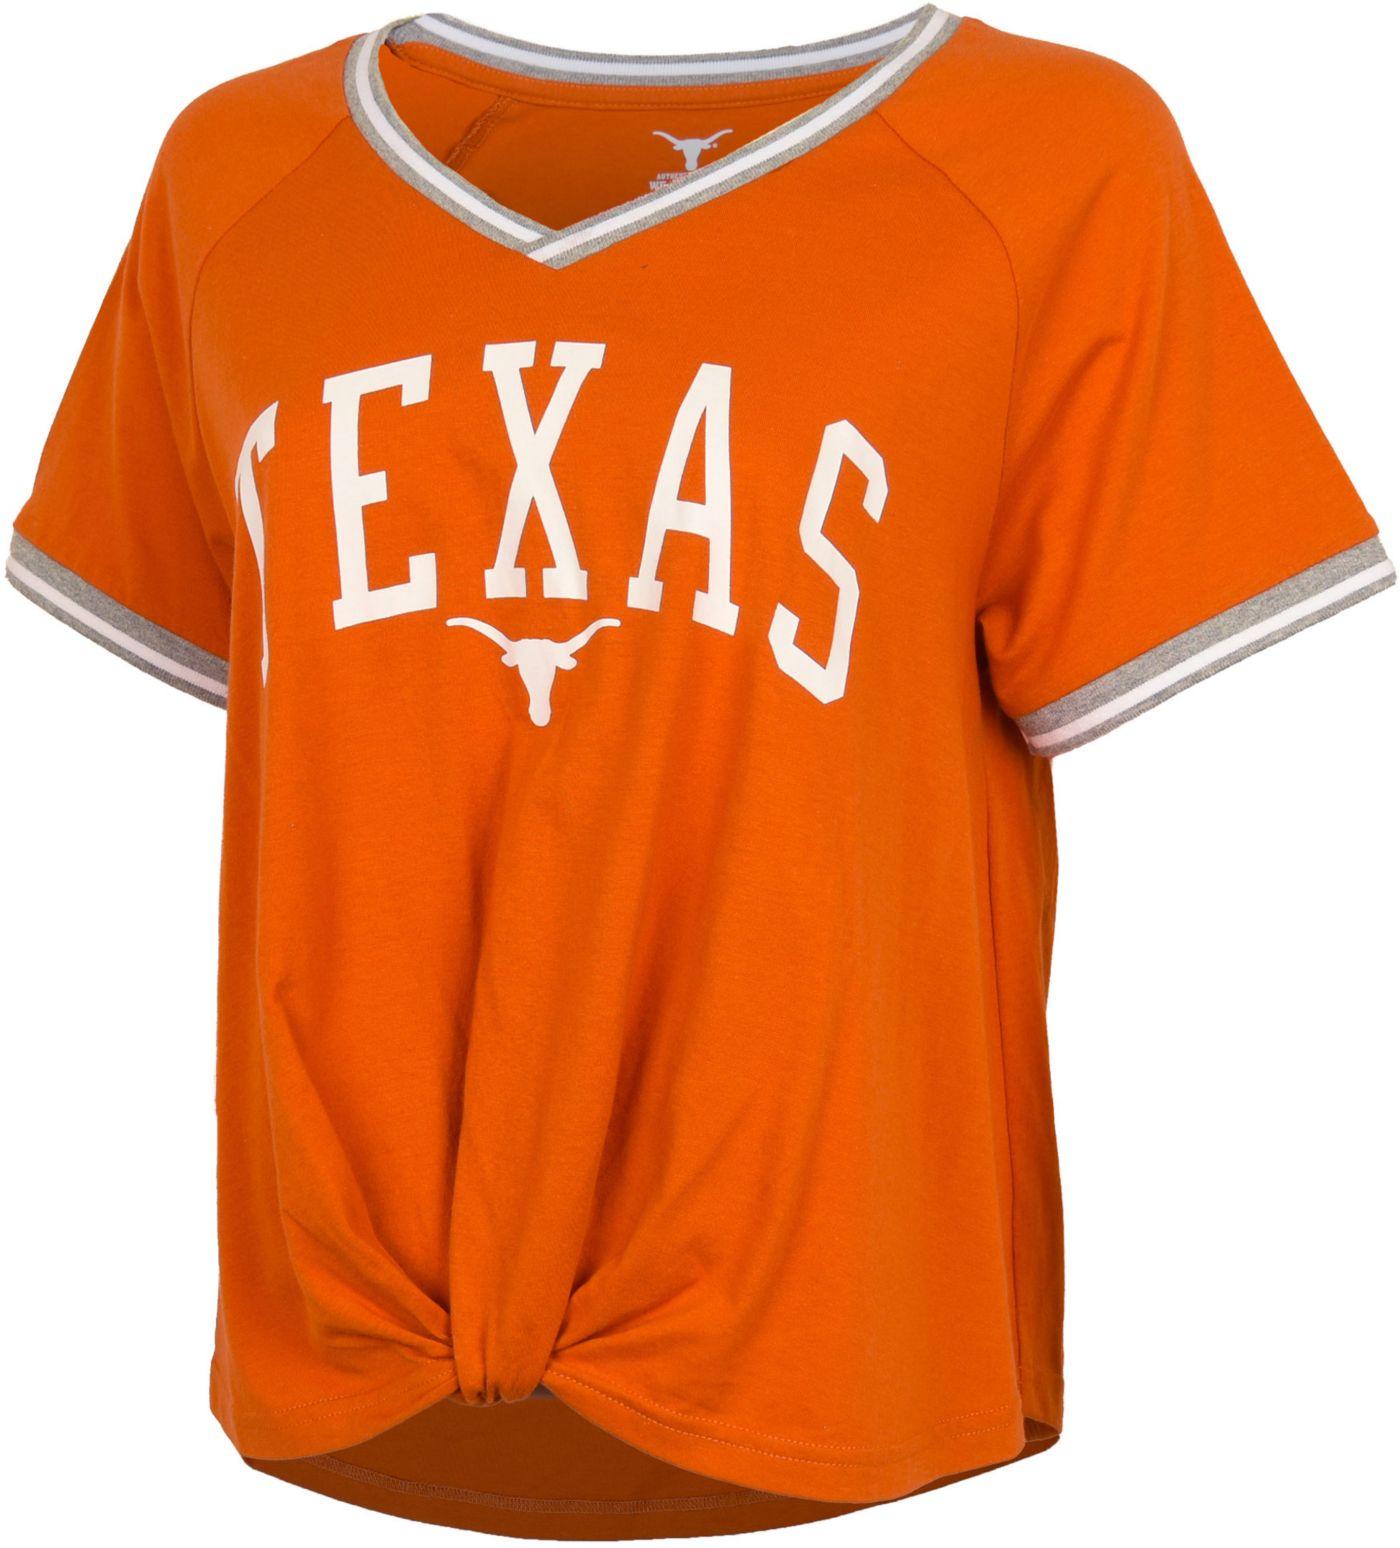 University of Texas Authentic Apparel Women's Texas Longhorns Burnt Orange Channing V-Neck T-Shirt